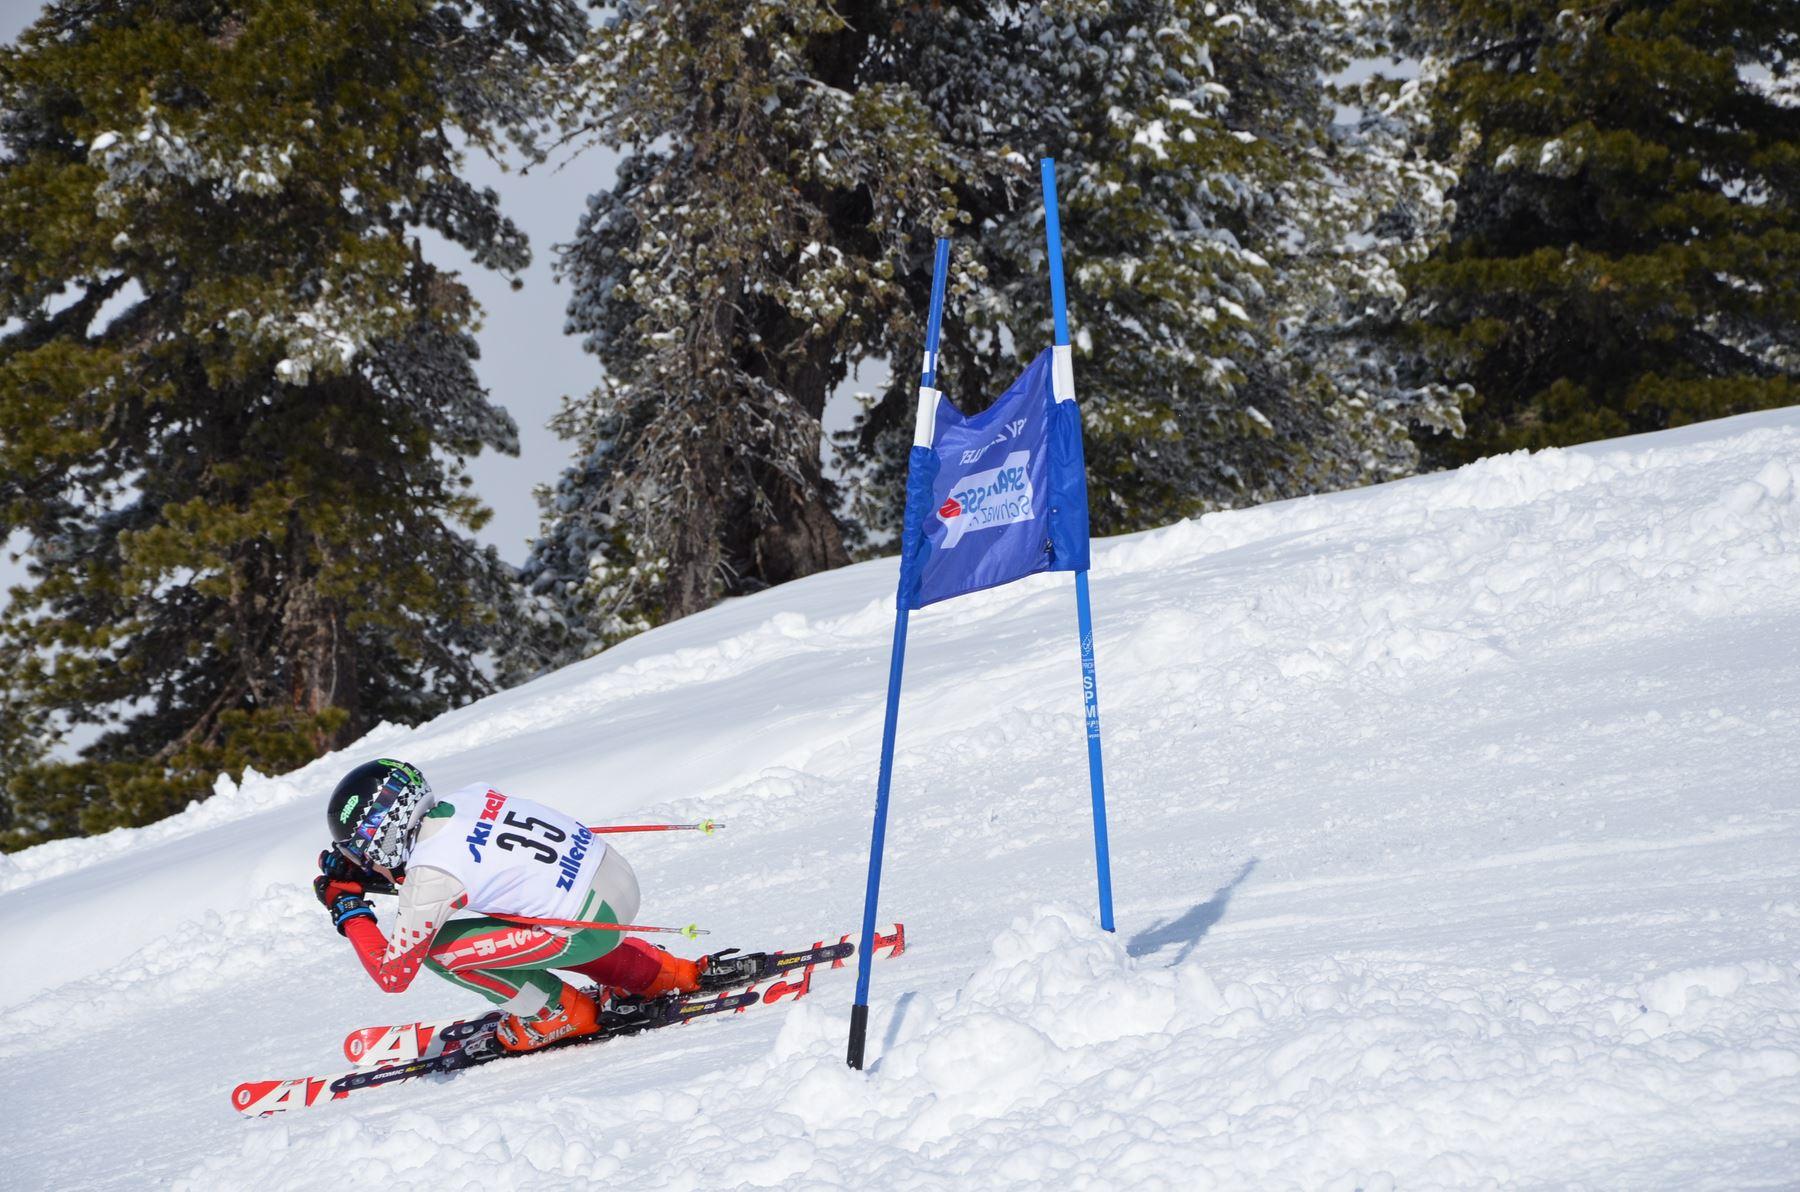 2015-03-22 BV Zillertal Skirennen 142.JPG